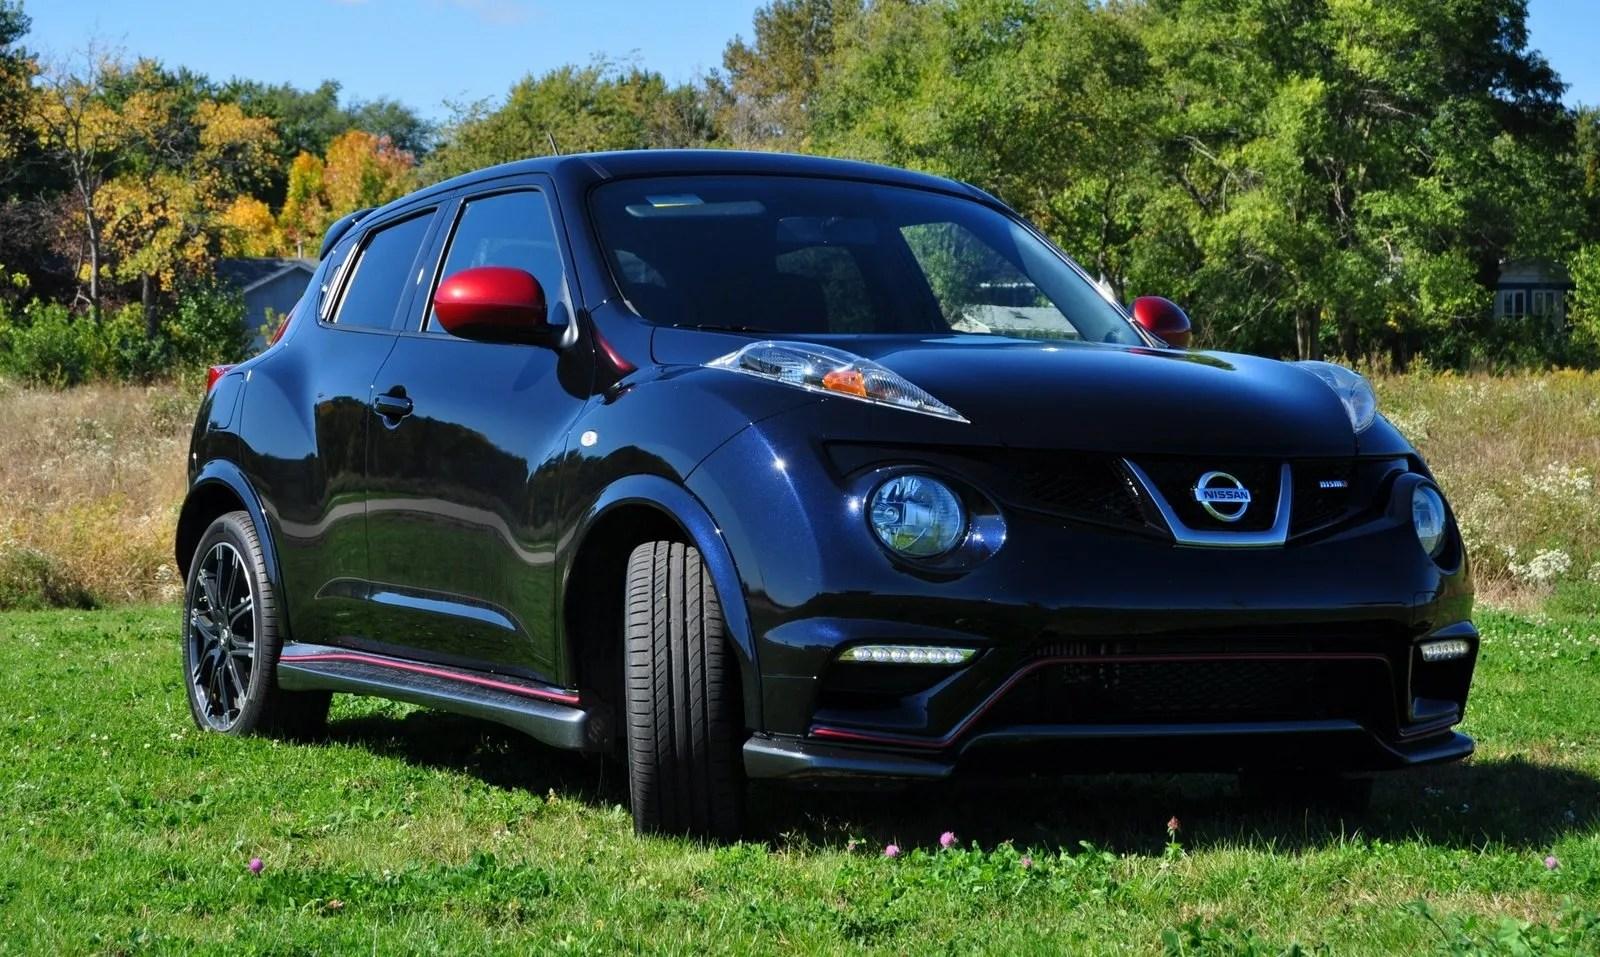 2014 Nissan Juke NISMO  Driven  Top Speed